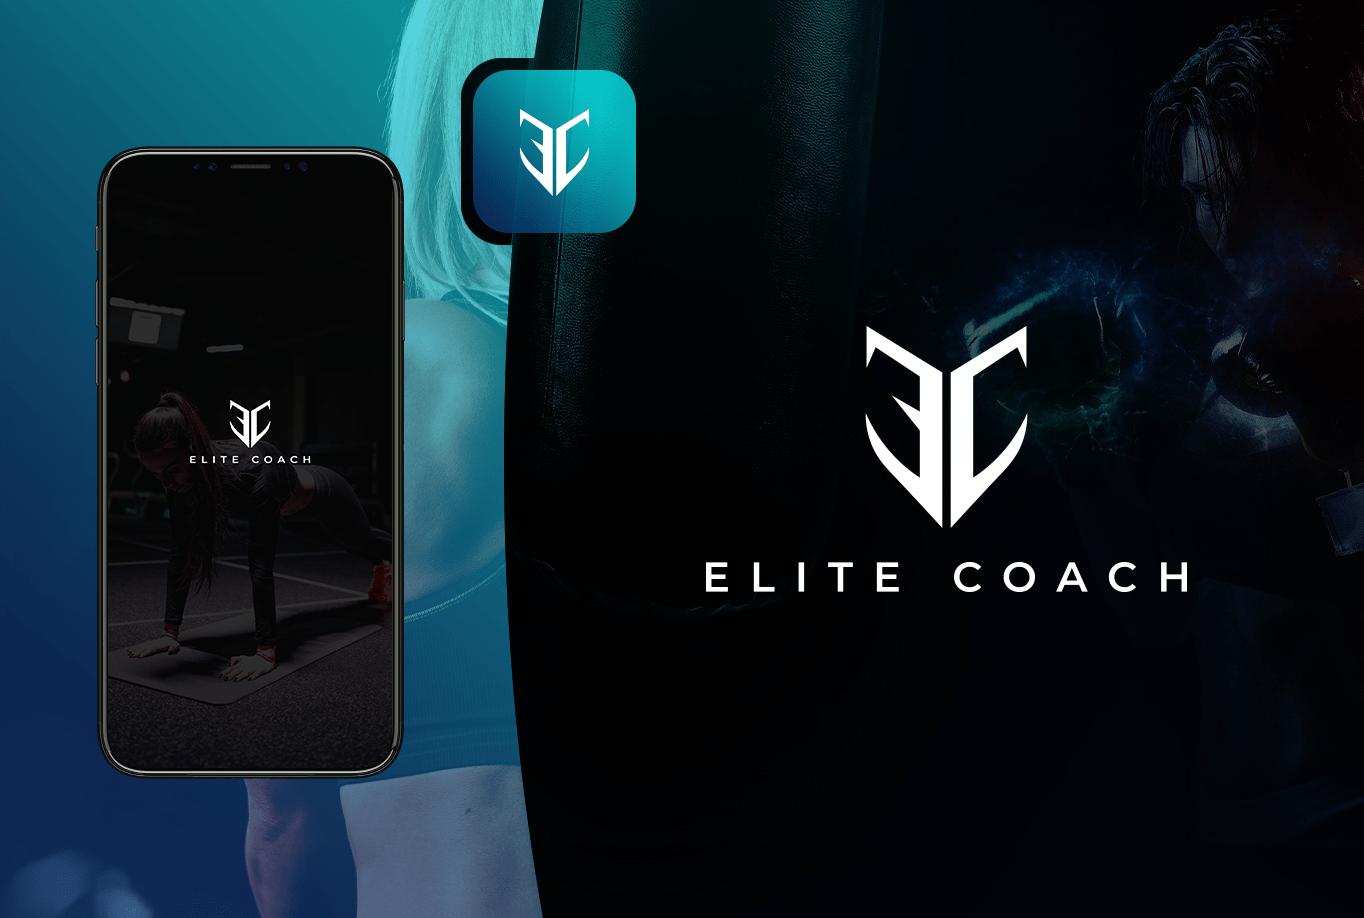 Elite Coach